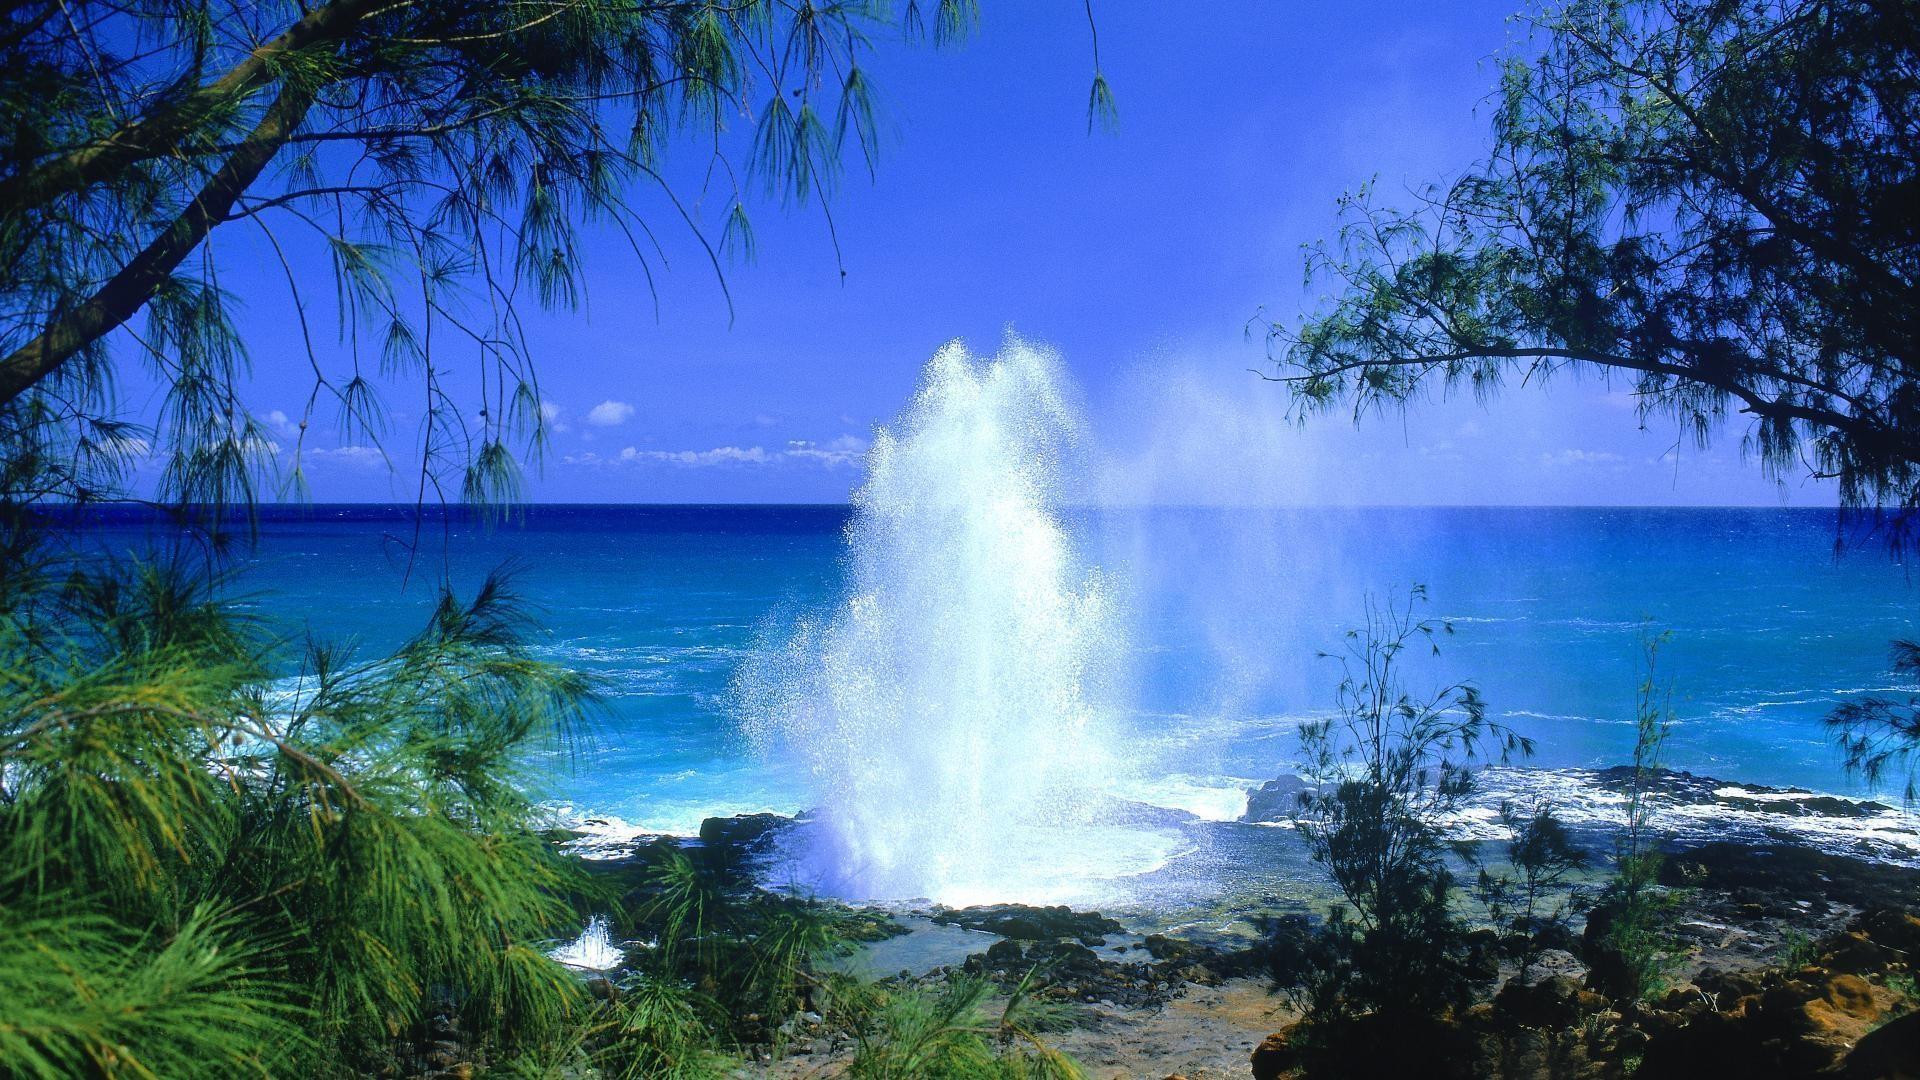 Hawaiian Beach Wallpaper: Hawaii Beach Water Gush Wallpaper Duhdek .